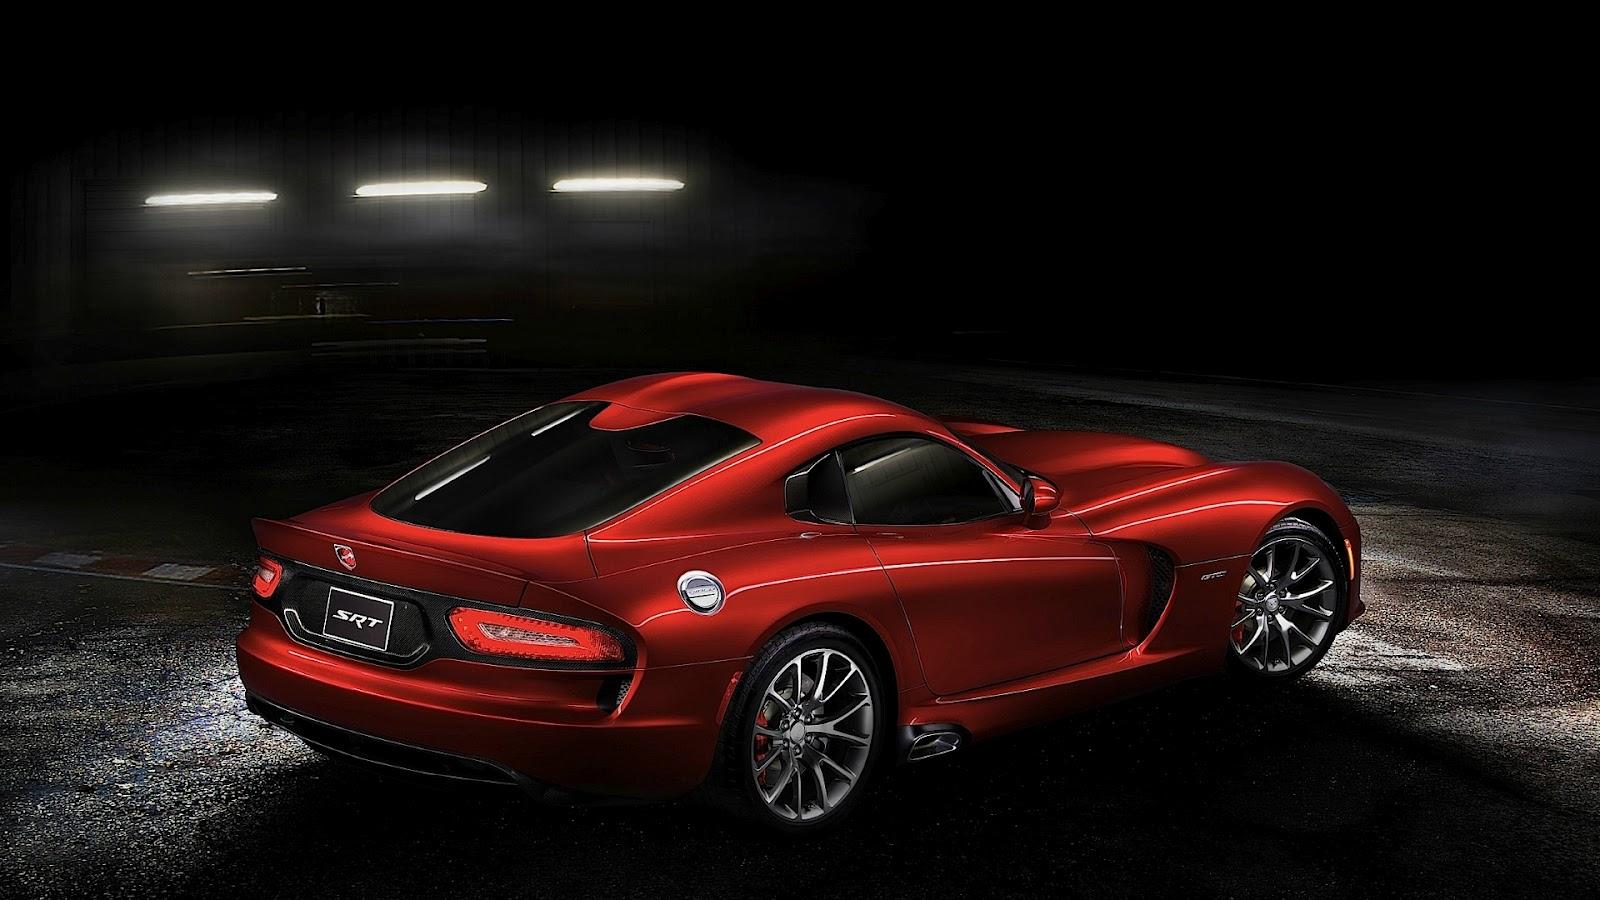 Free Cars HD: Dodge Viper SRT HD Wallpapers